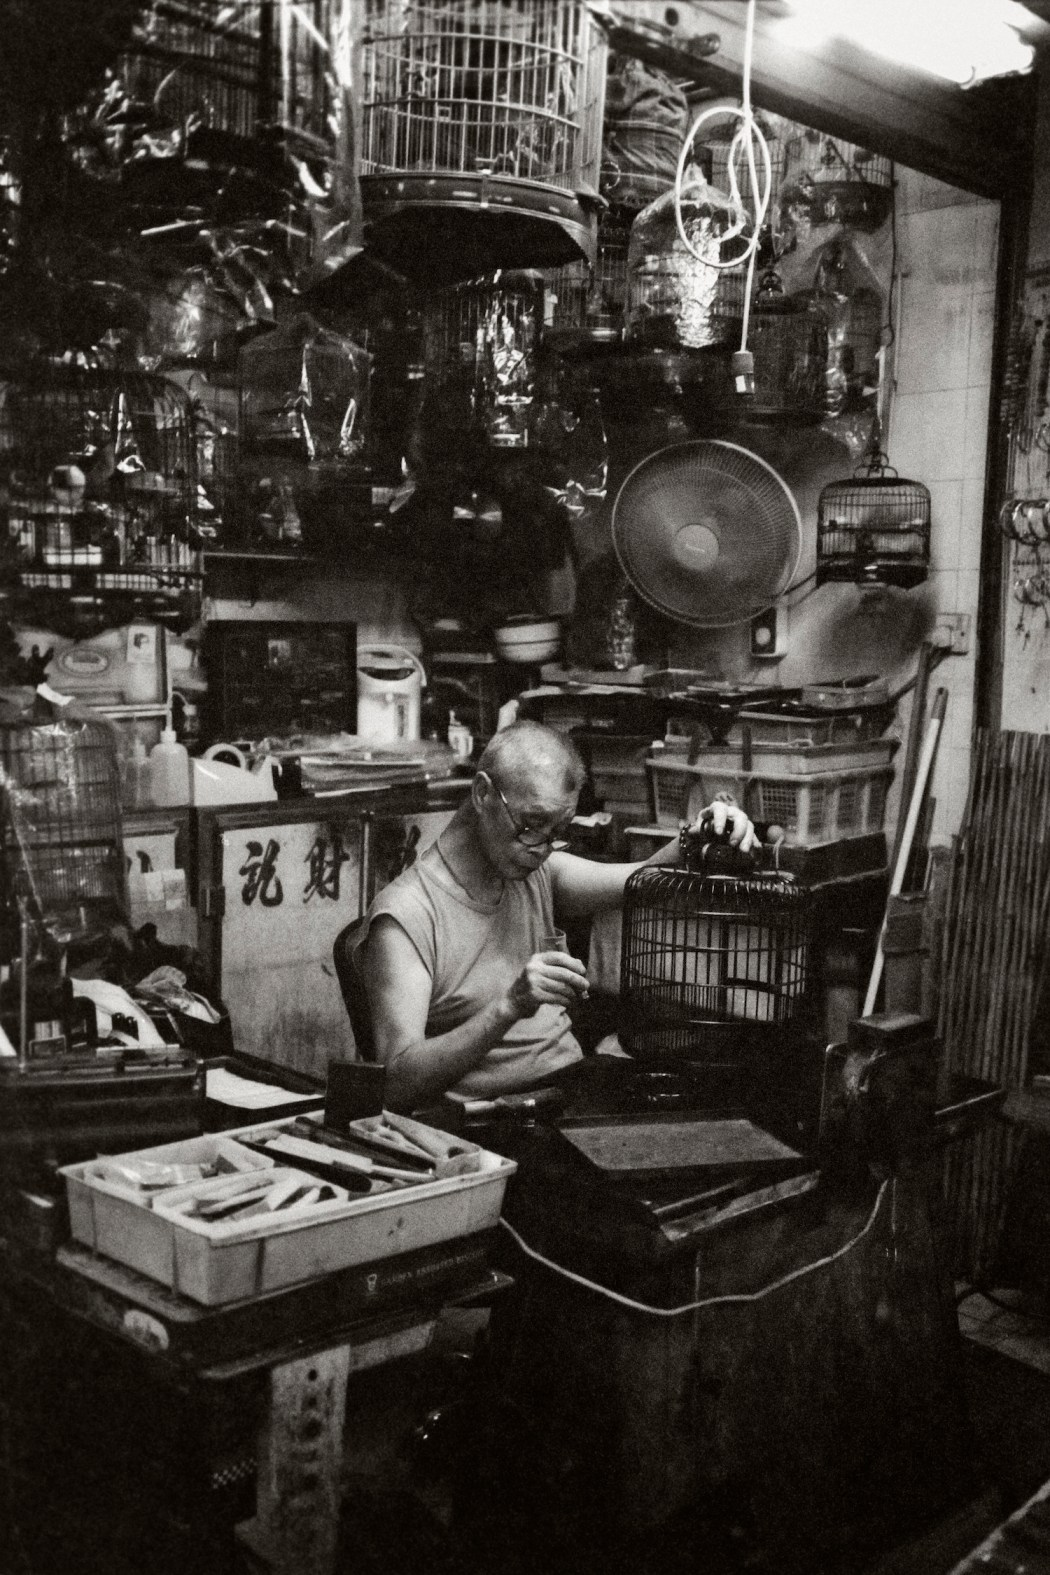 Gideon de Kock - The Old Man And The Birds